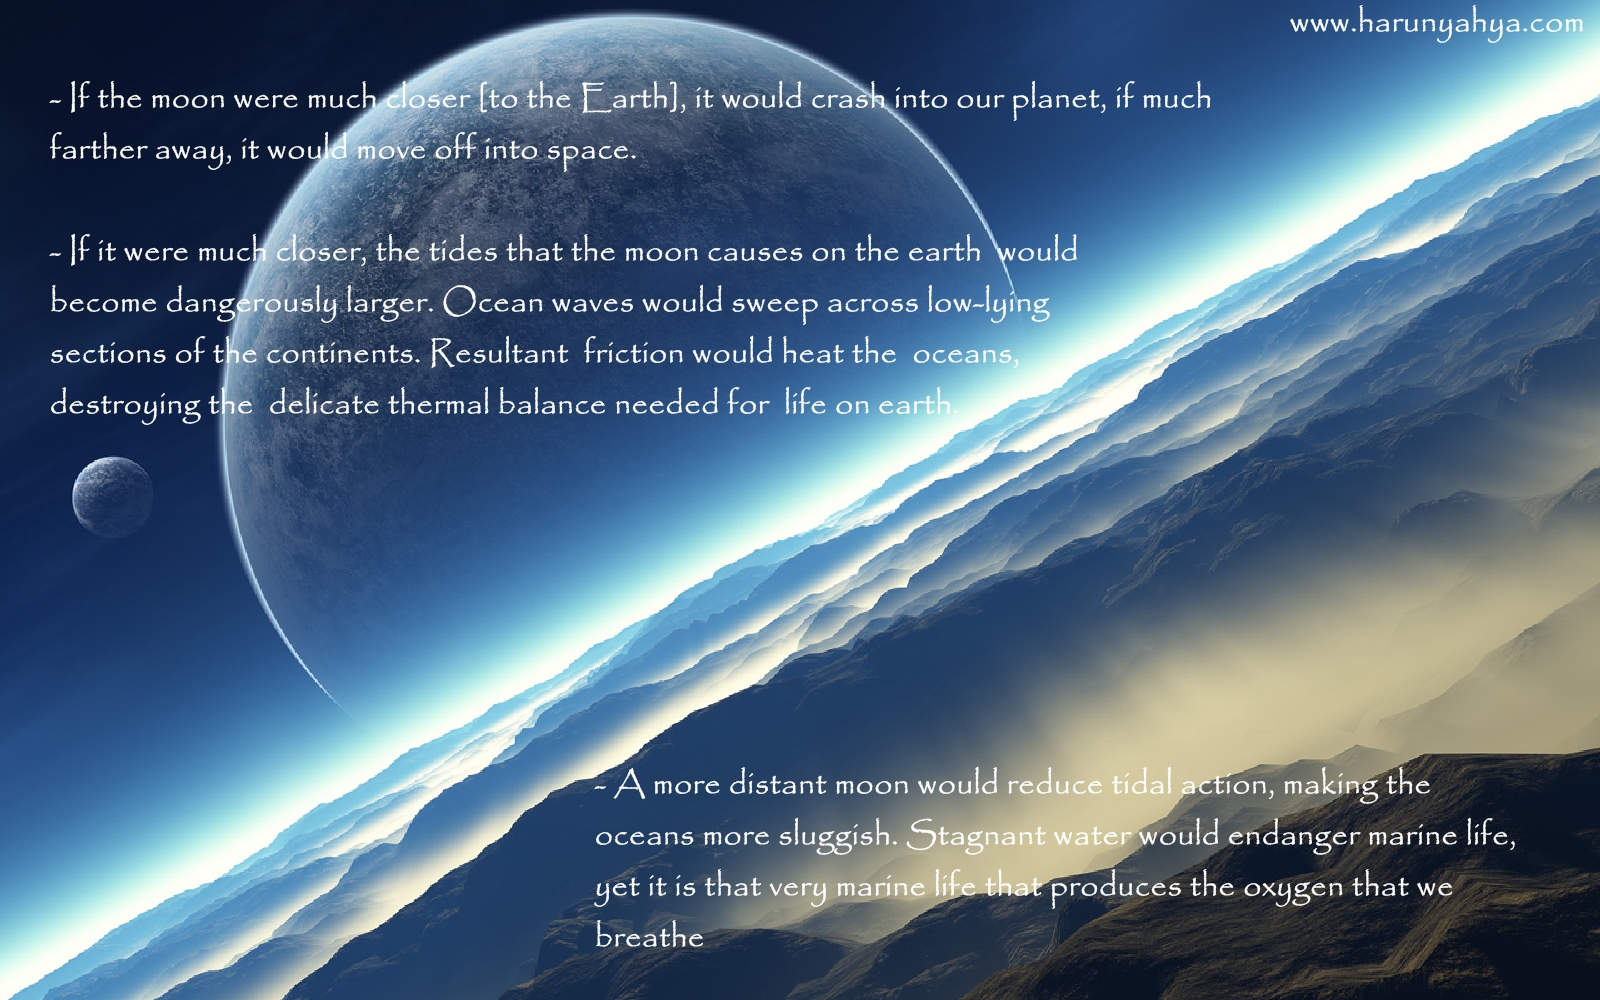 http://4.bp.blogspot.com/-UwRNHZ1zjDE/TvfA7On3exI/AAAAAAAAAGo/hrsWrxMlrCk/s1600/earth1.jpg